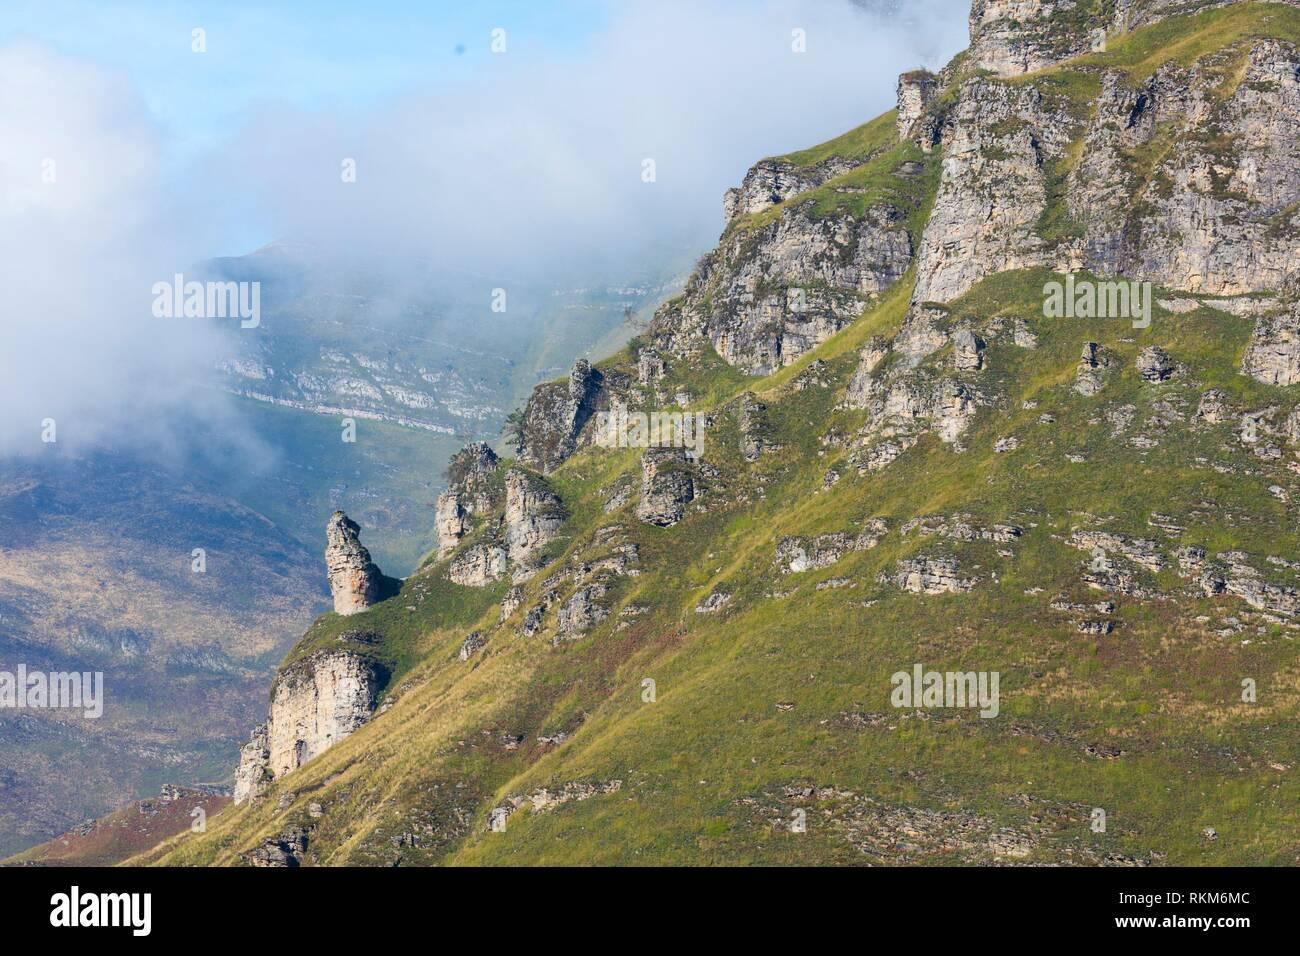 Vue depuis le Mirador de Covalruyu, Miera Vallée, Valles Pasiegos, Cantabria, Espagne, Europe. Banque D'Images